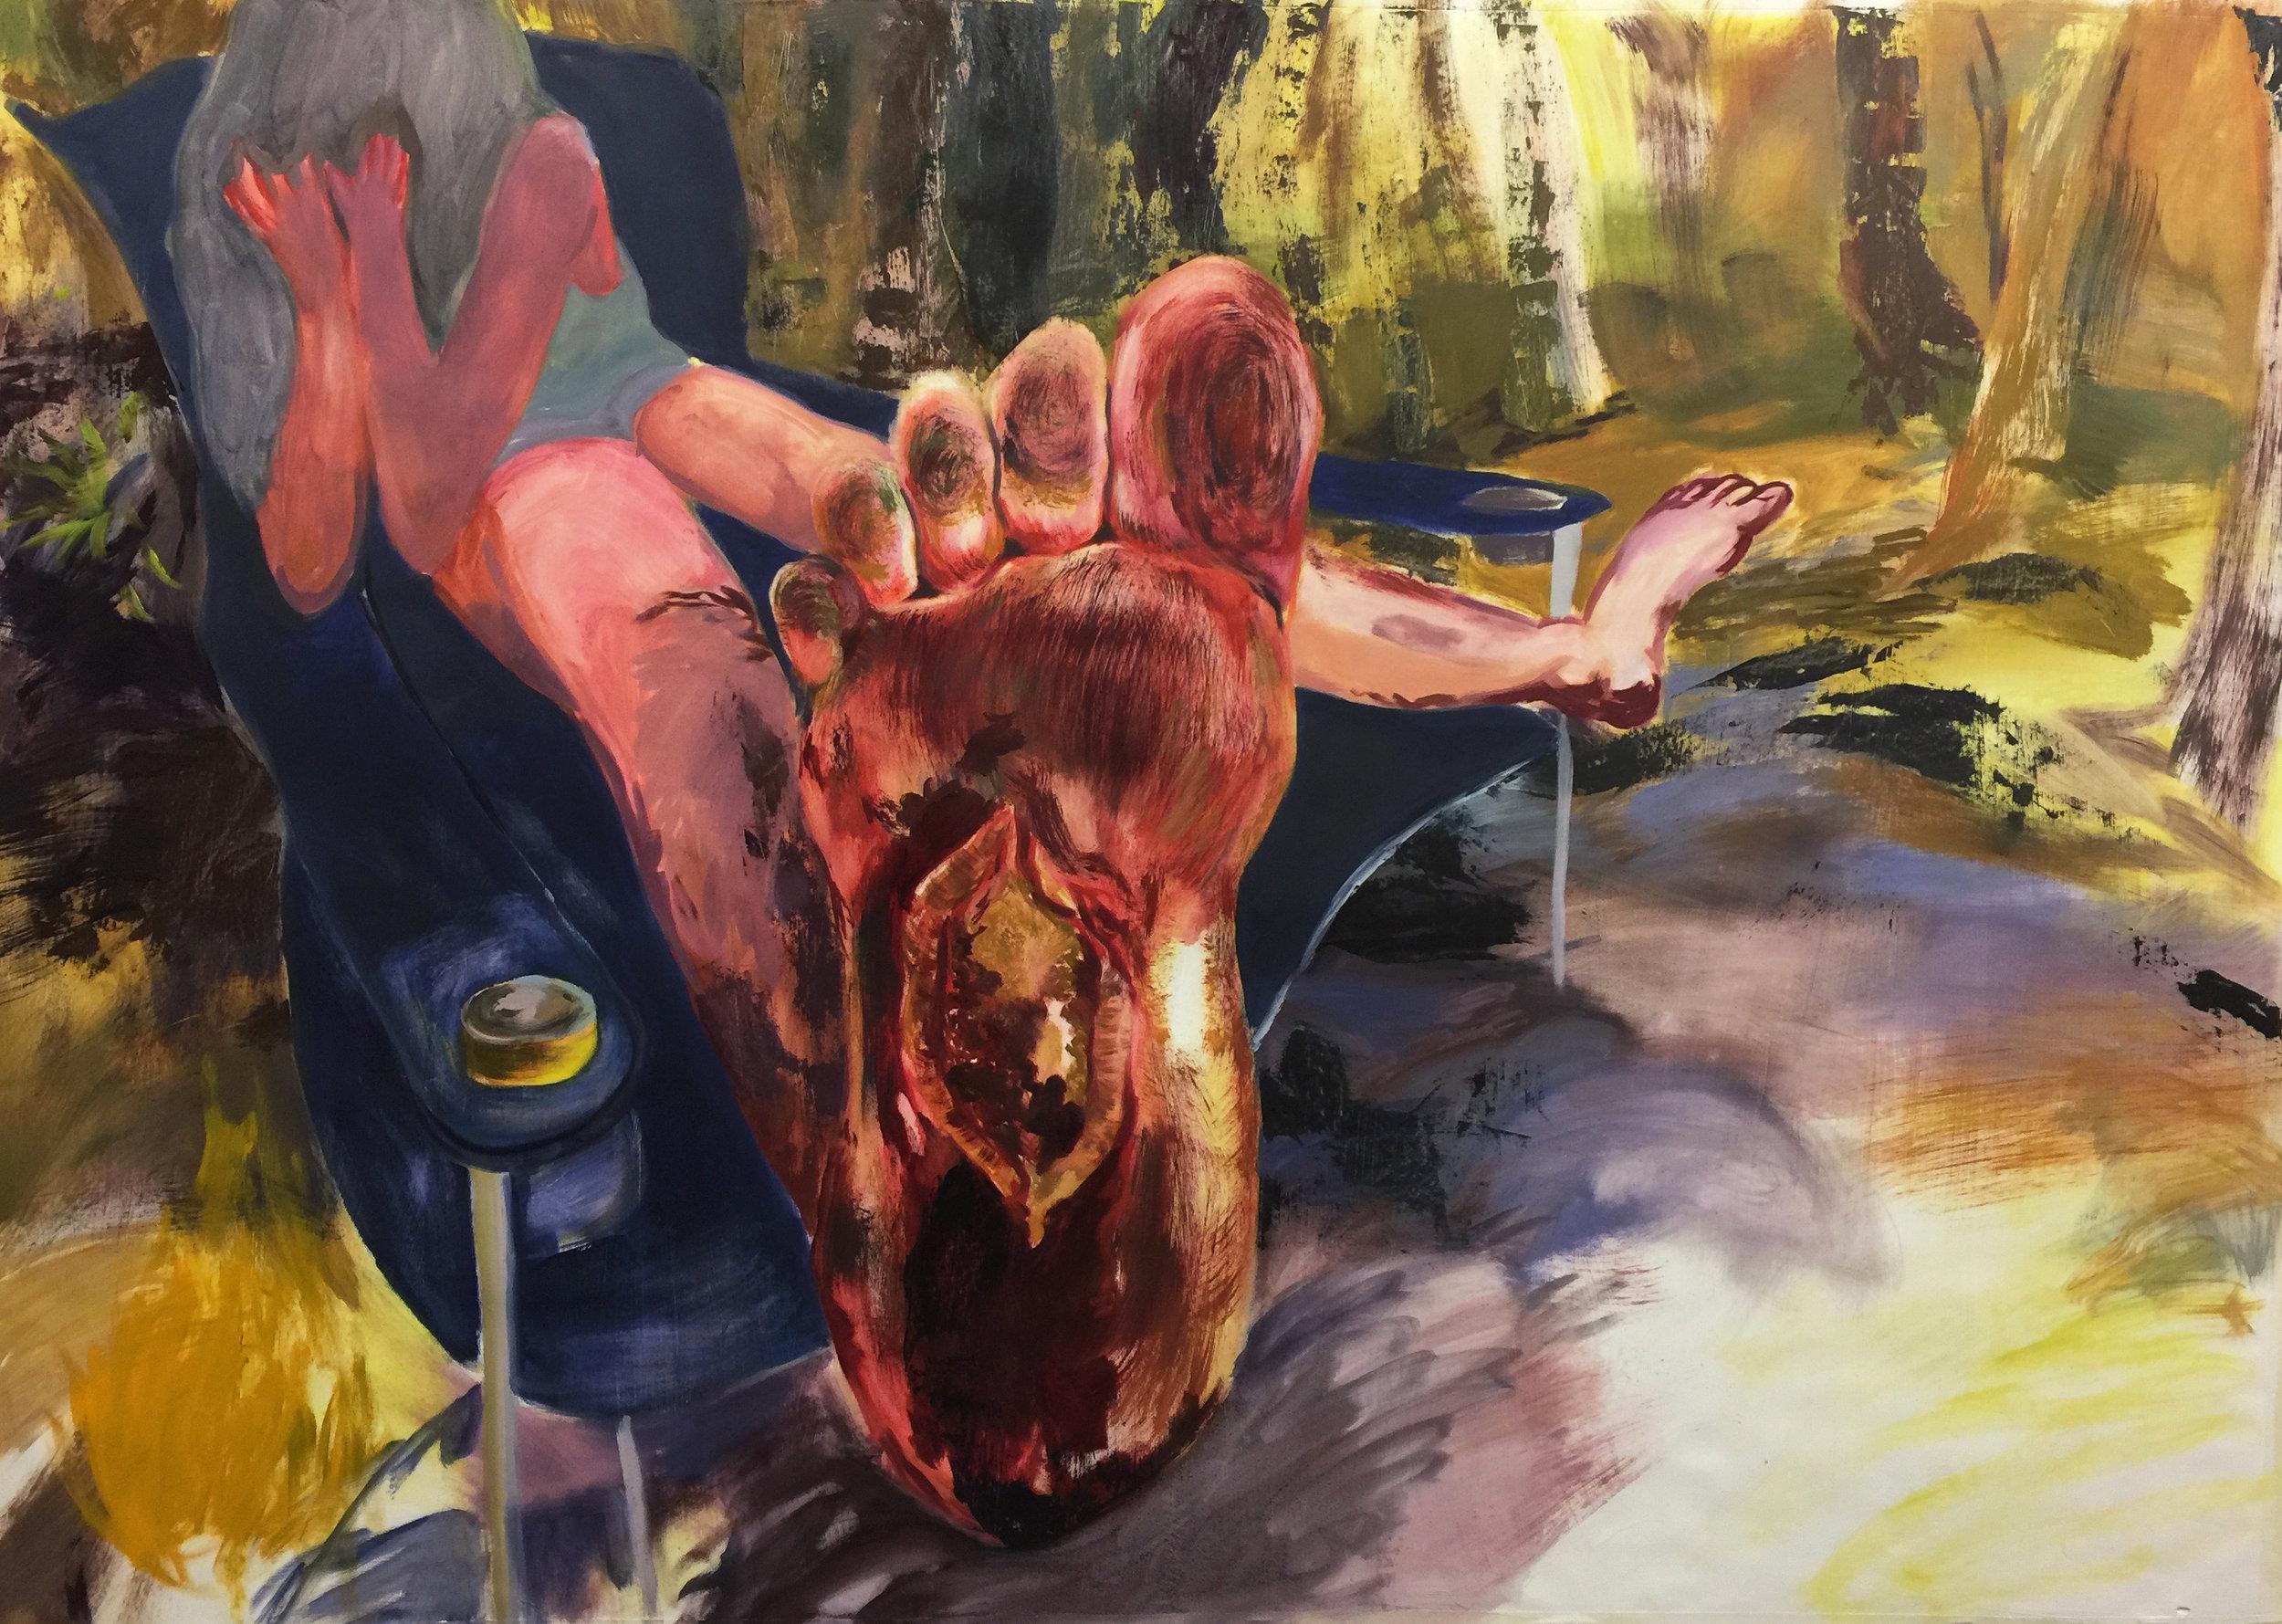 Cut Foot and Rubbed In Dirt (Suwannee Swifty Feet)